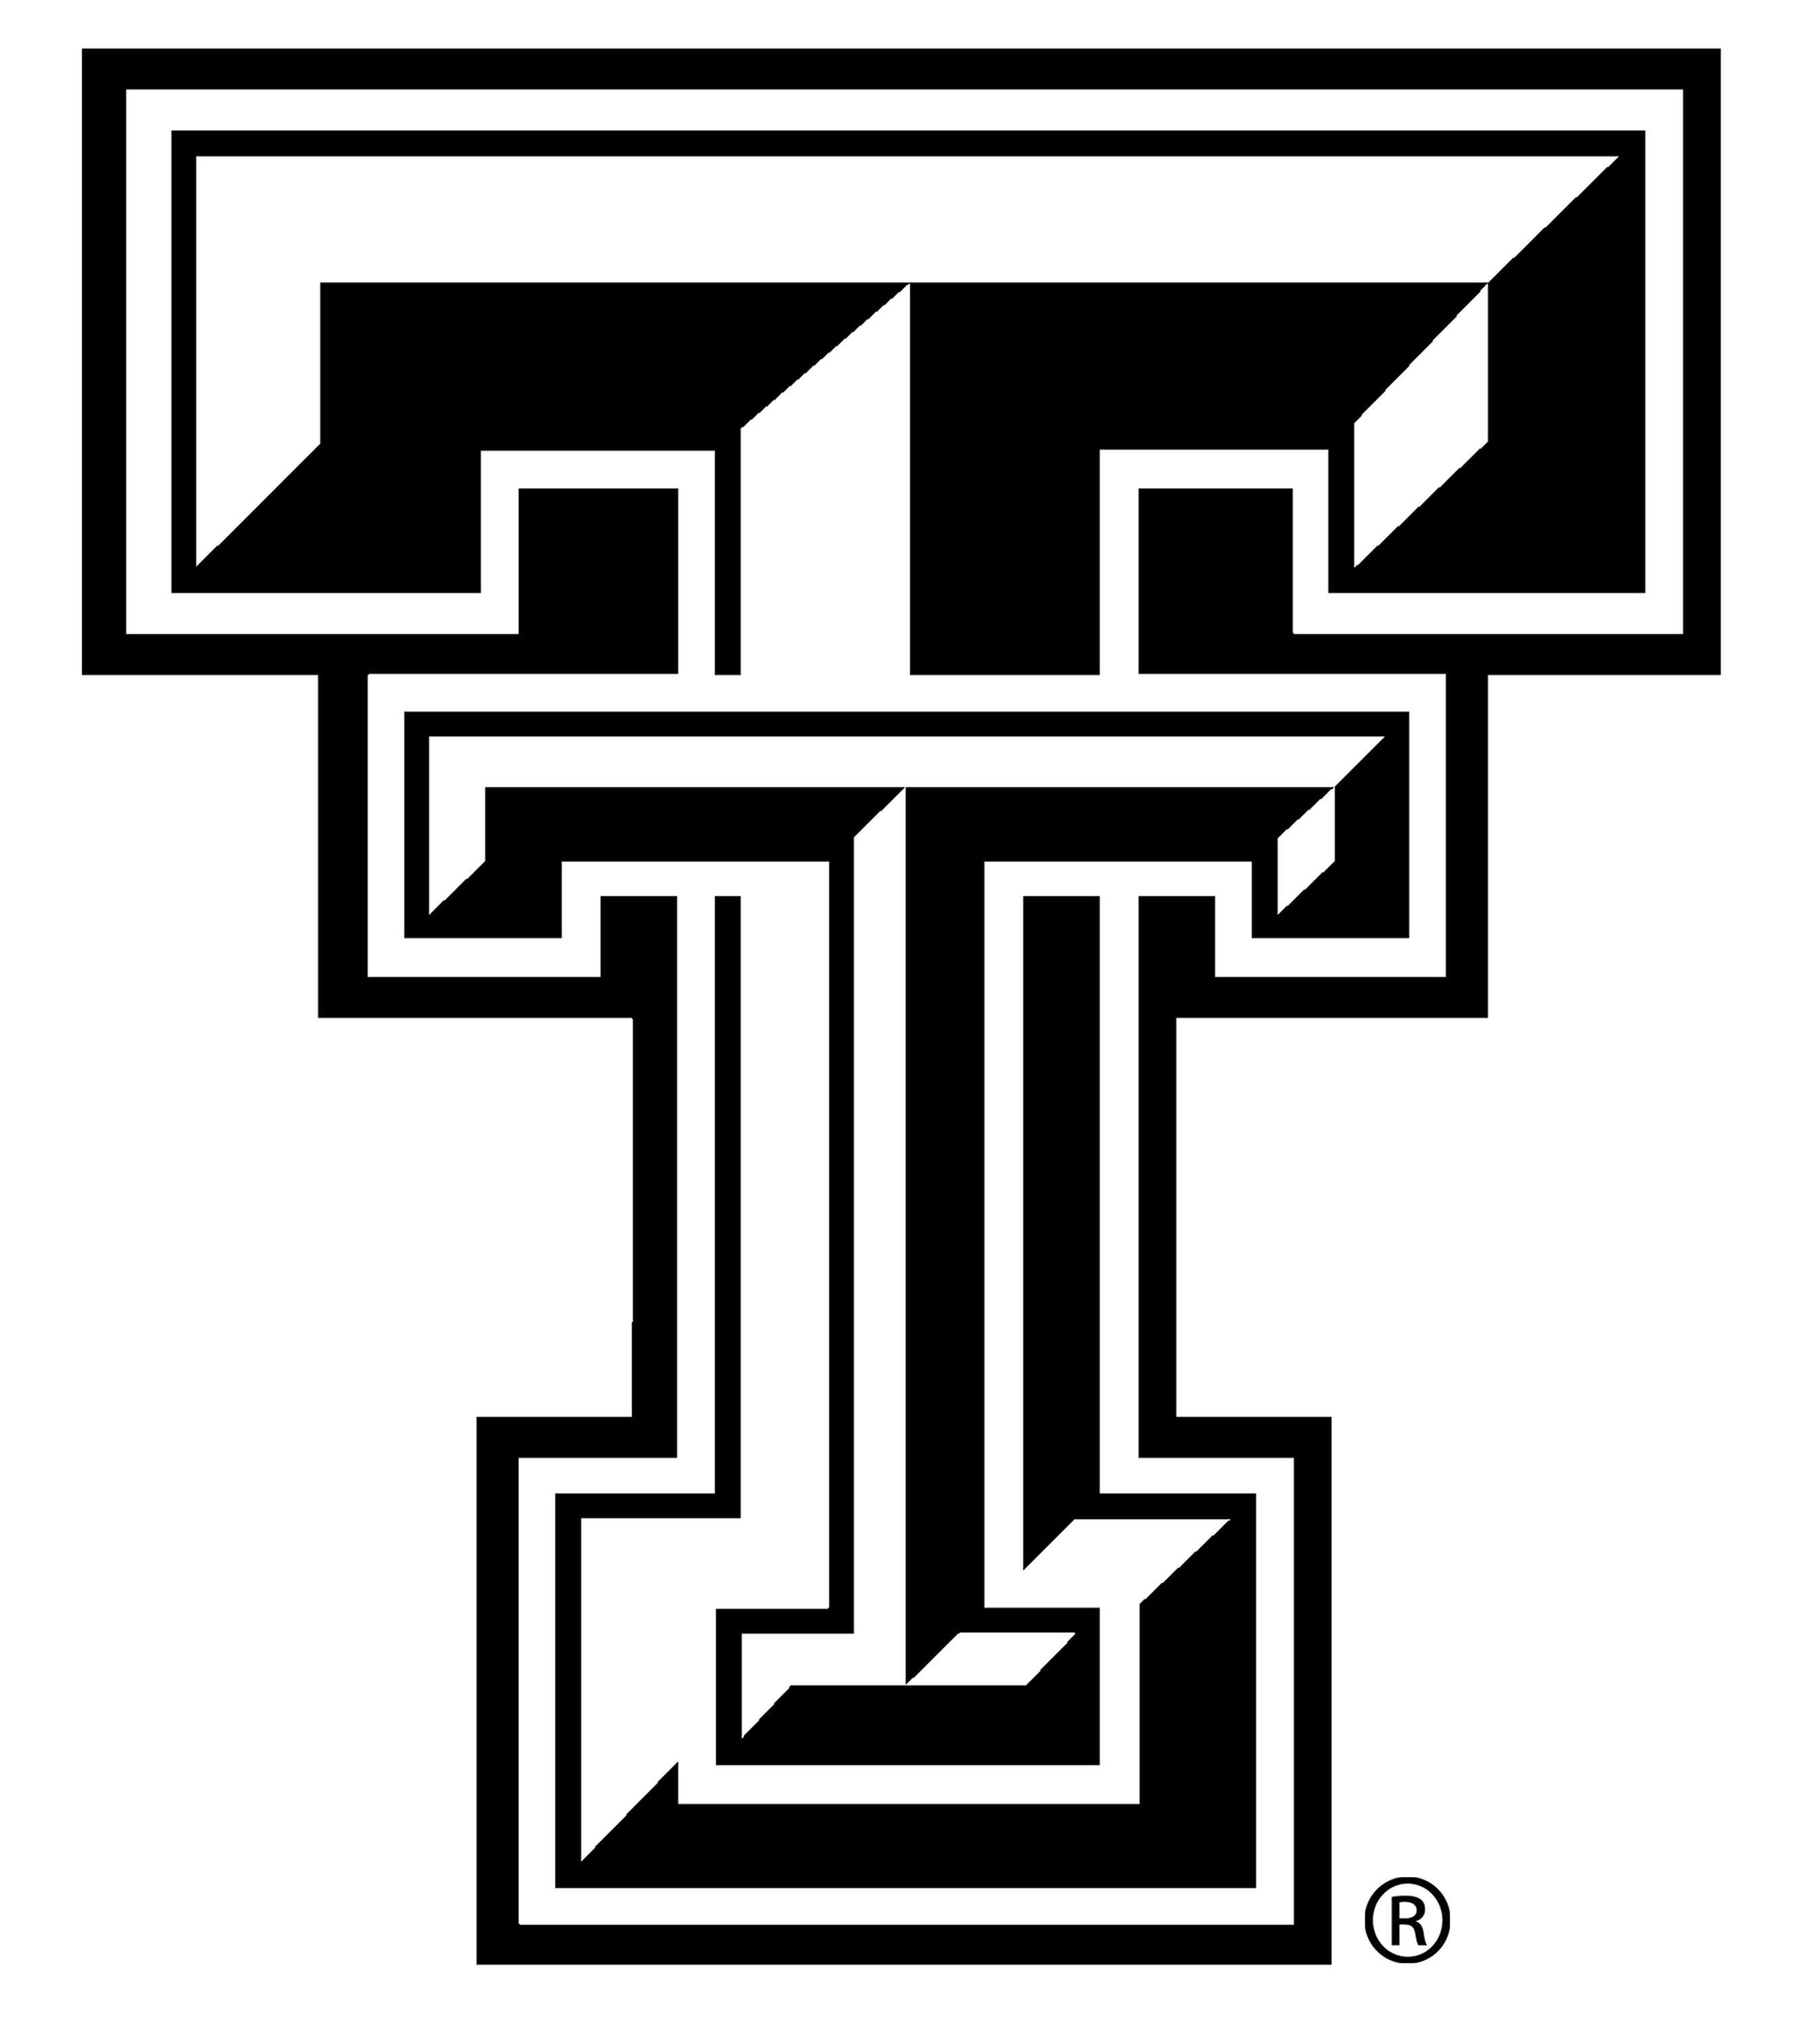 Pin By Christina Rhea On Svg Texas Tech Logo Texas Tech